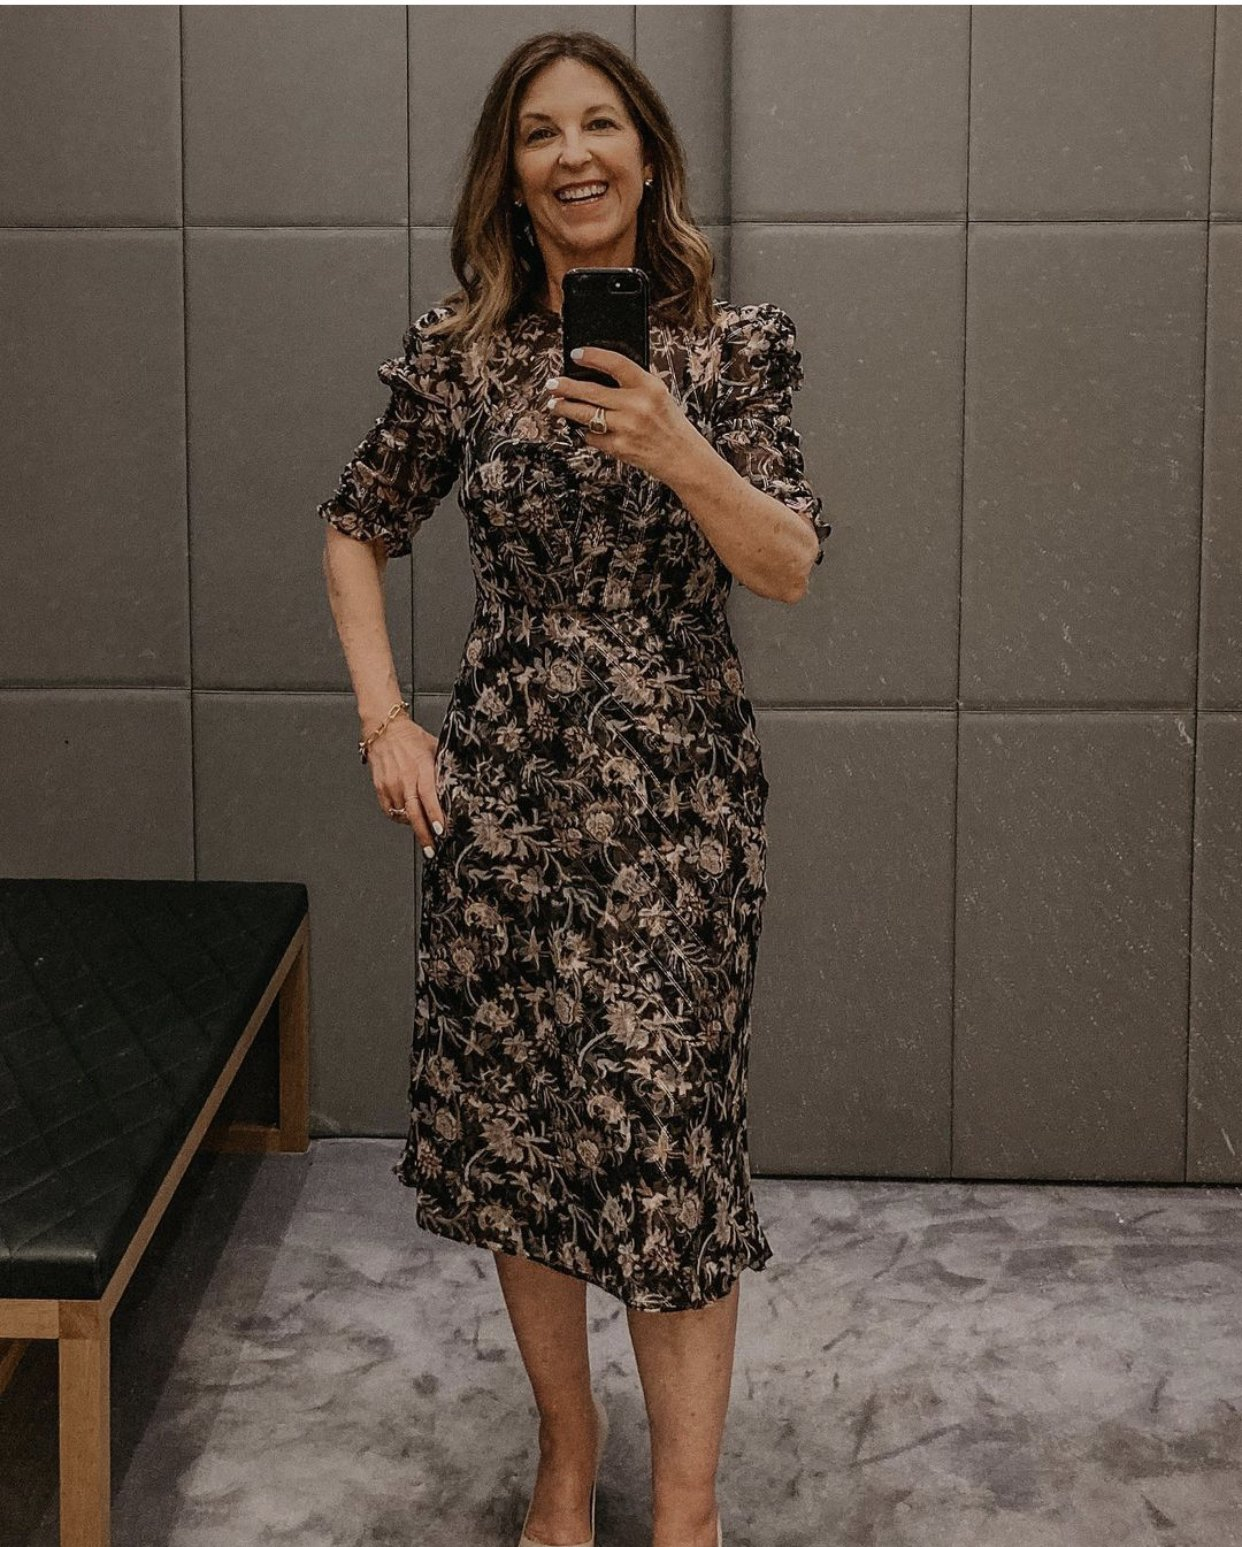 mirror selfie floral dress